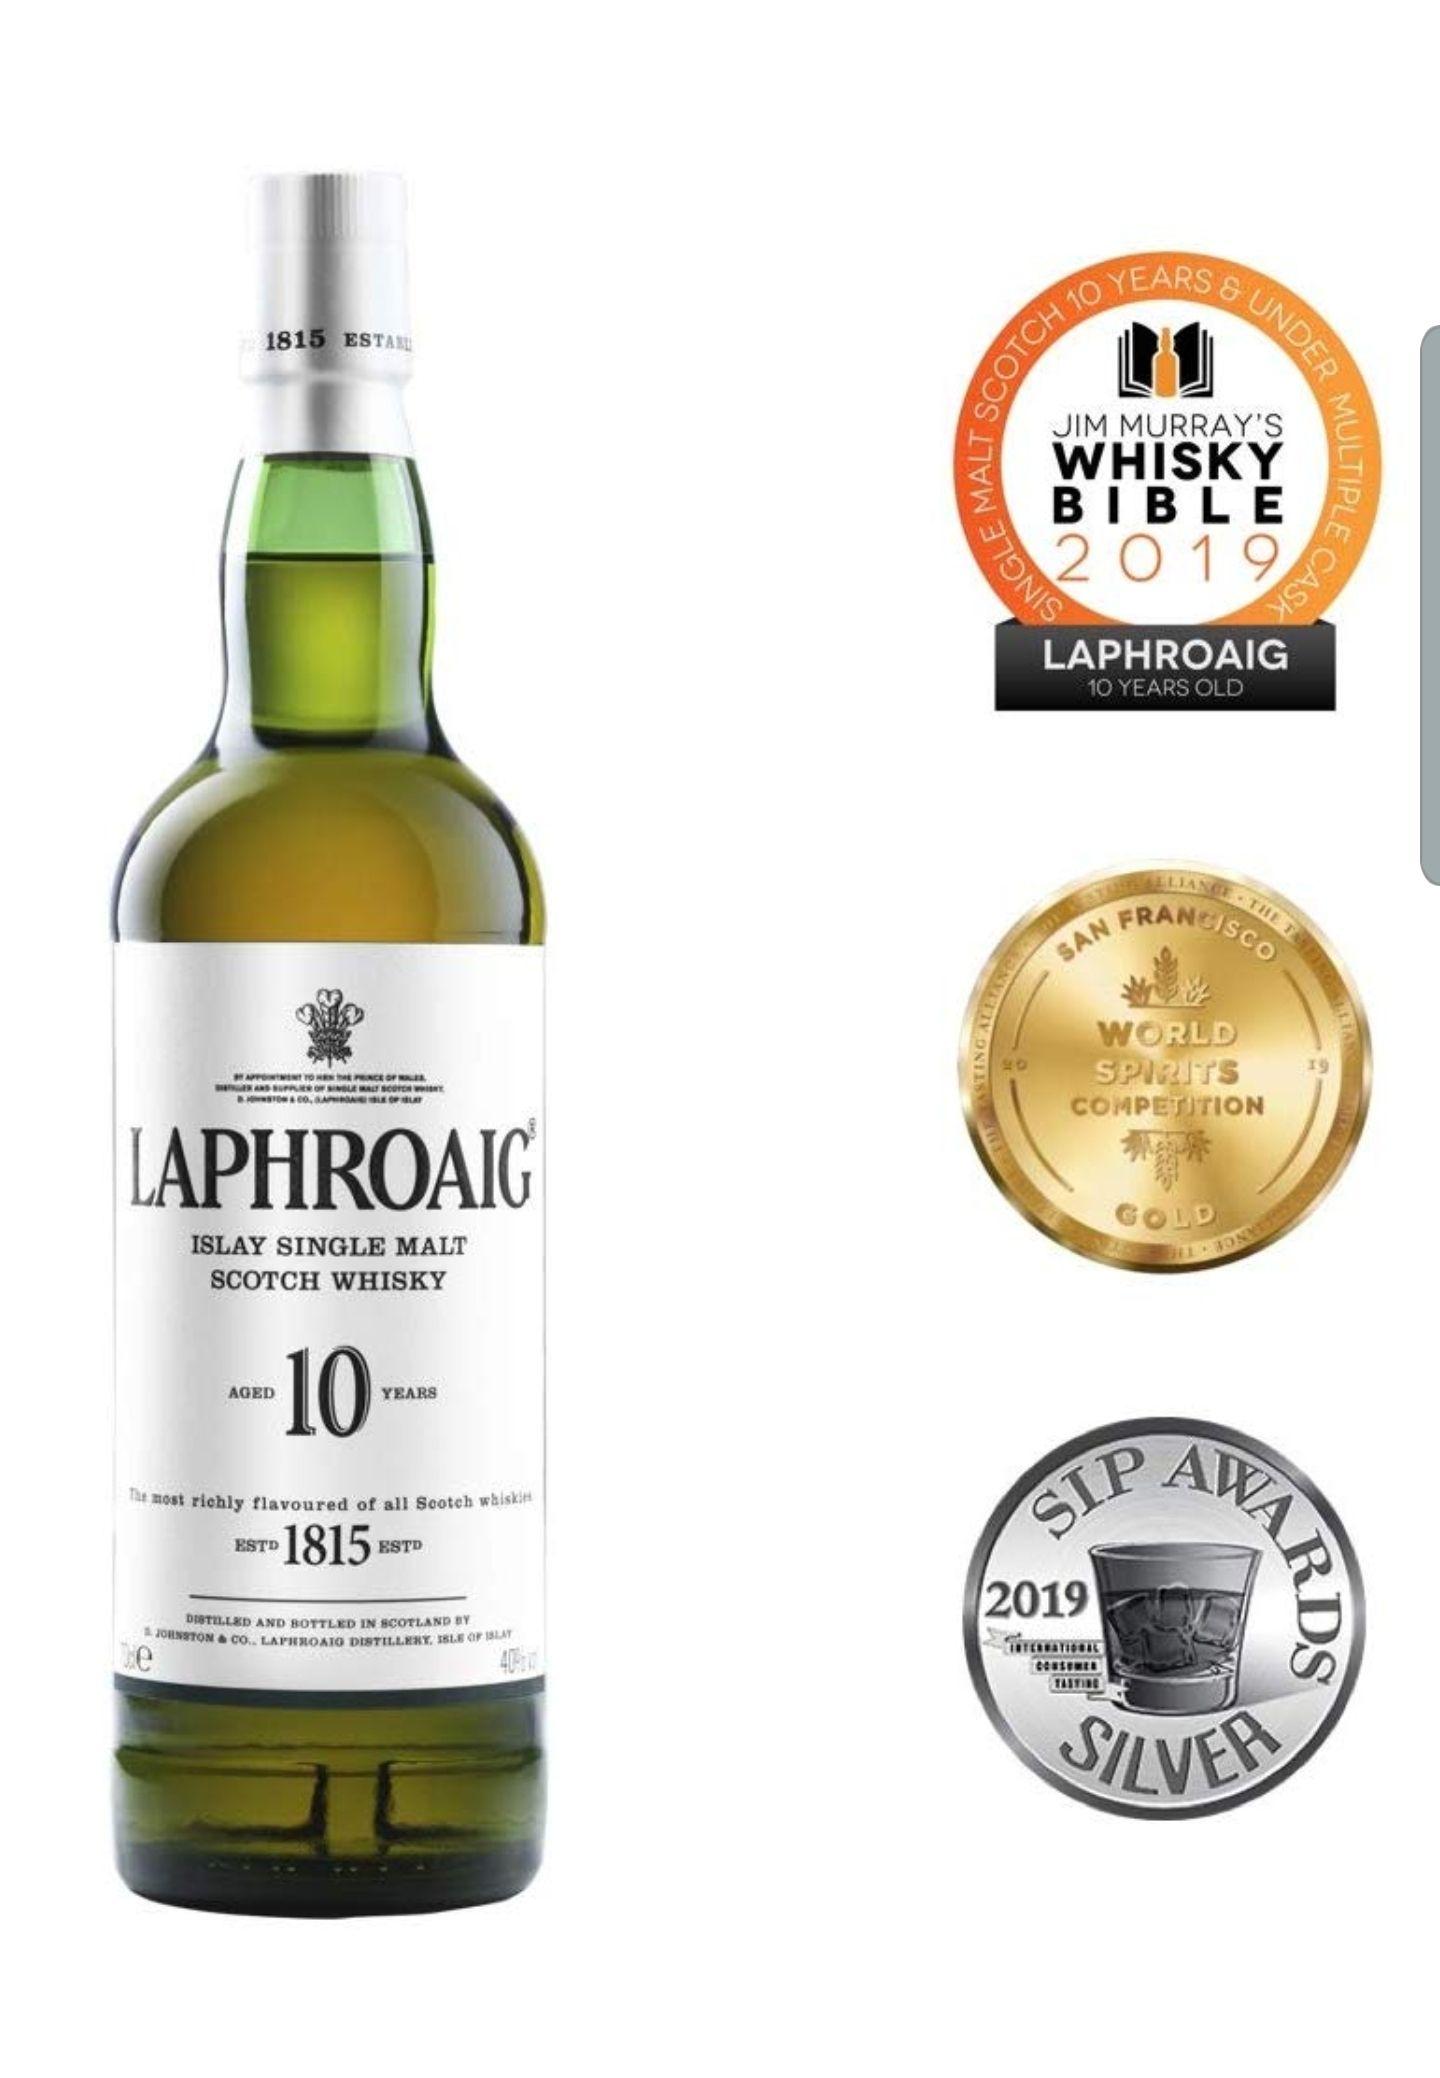 Laphroaig 10 Year Old Islay Single Malt Scotch Whisky, 70 cl £26 at Amazon and Tesco.